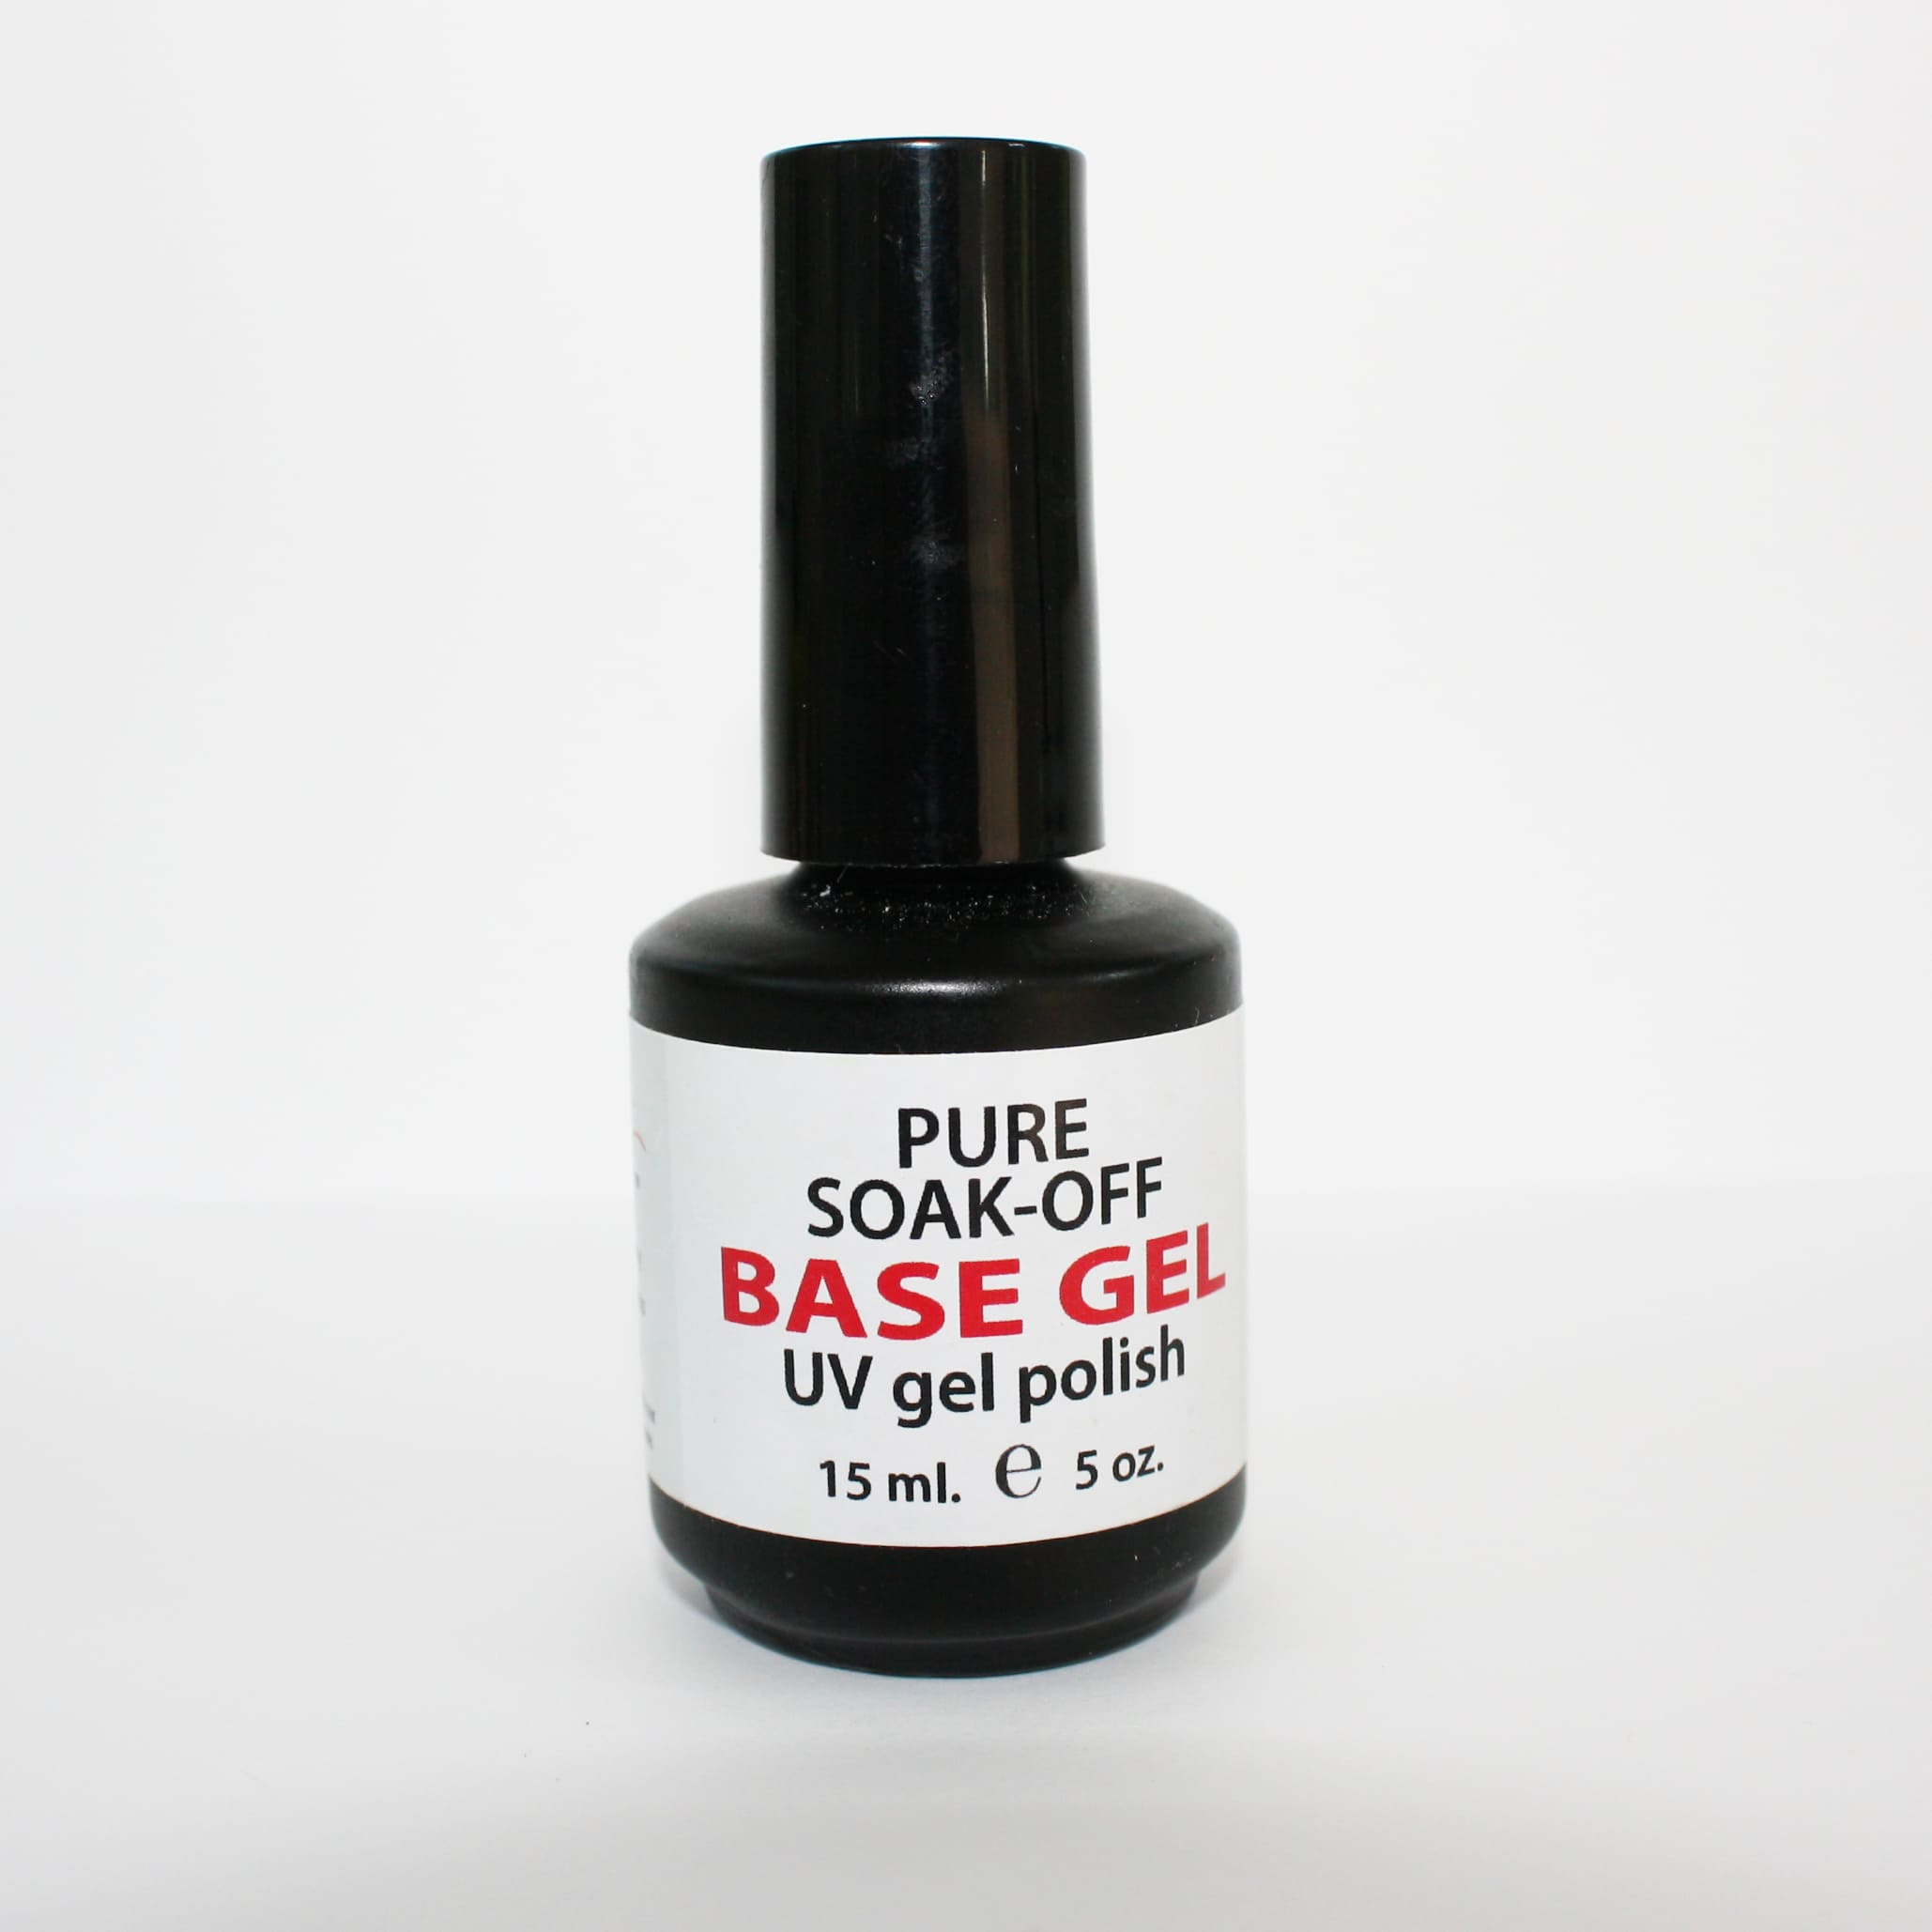 PURE Soak-off BASE GEL